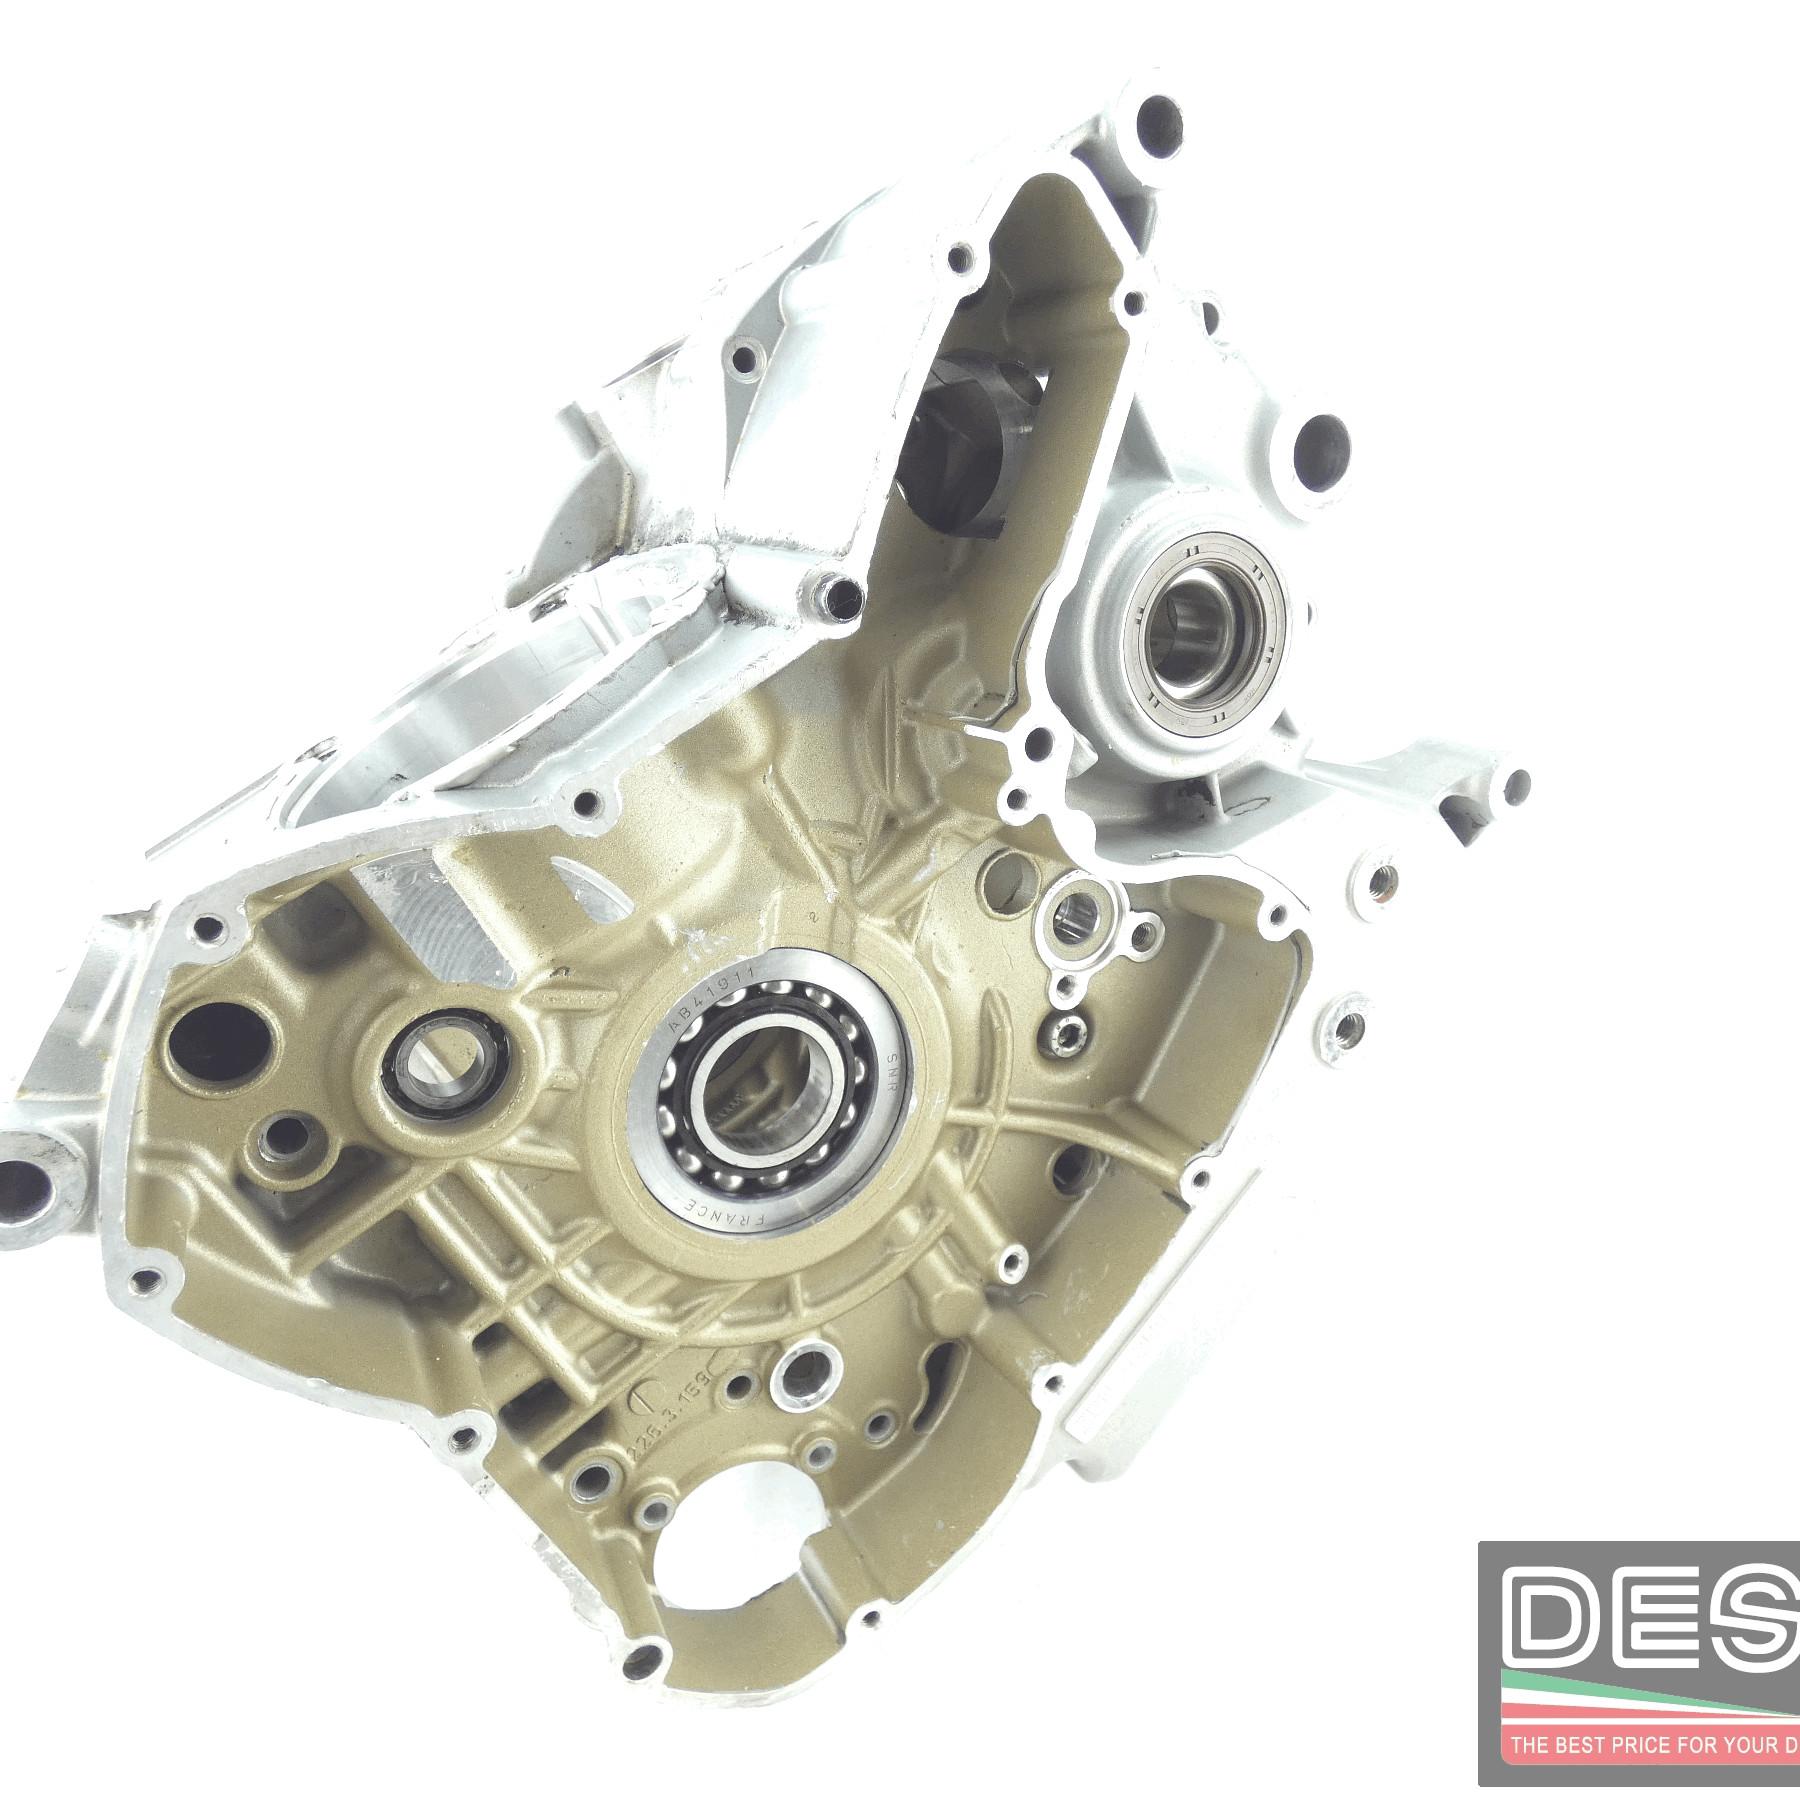 Casse carter motore ducati 848